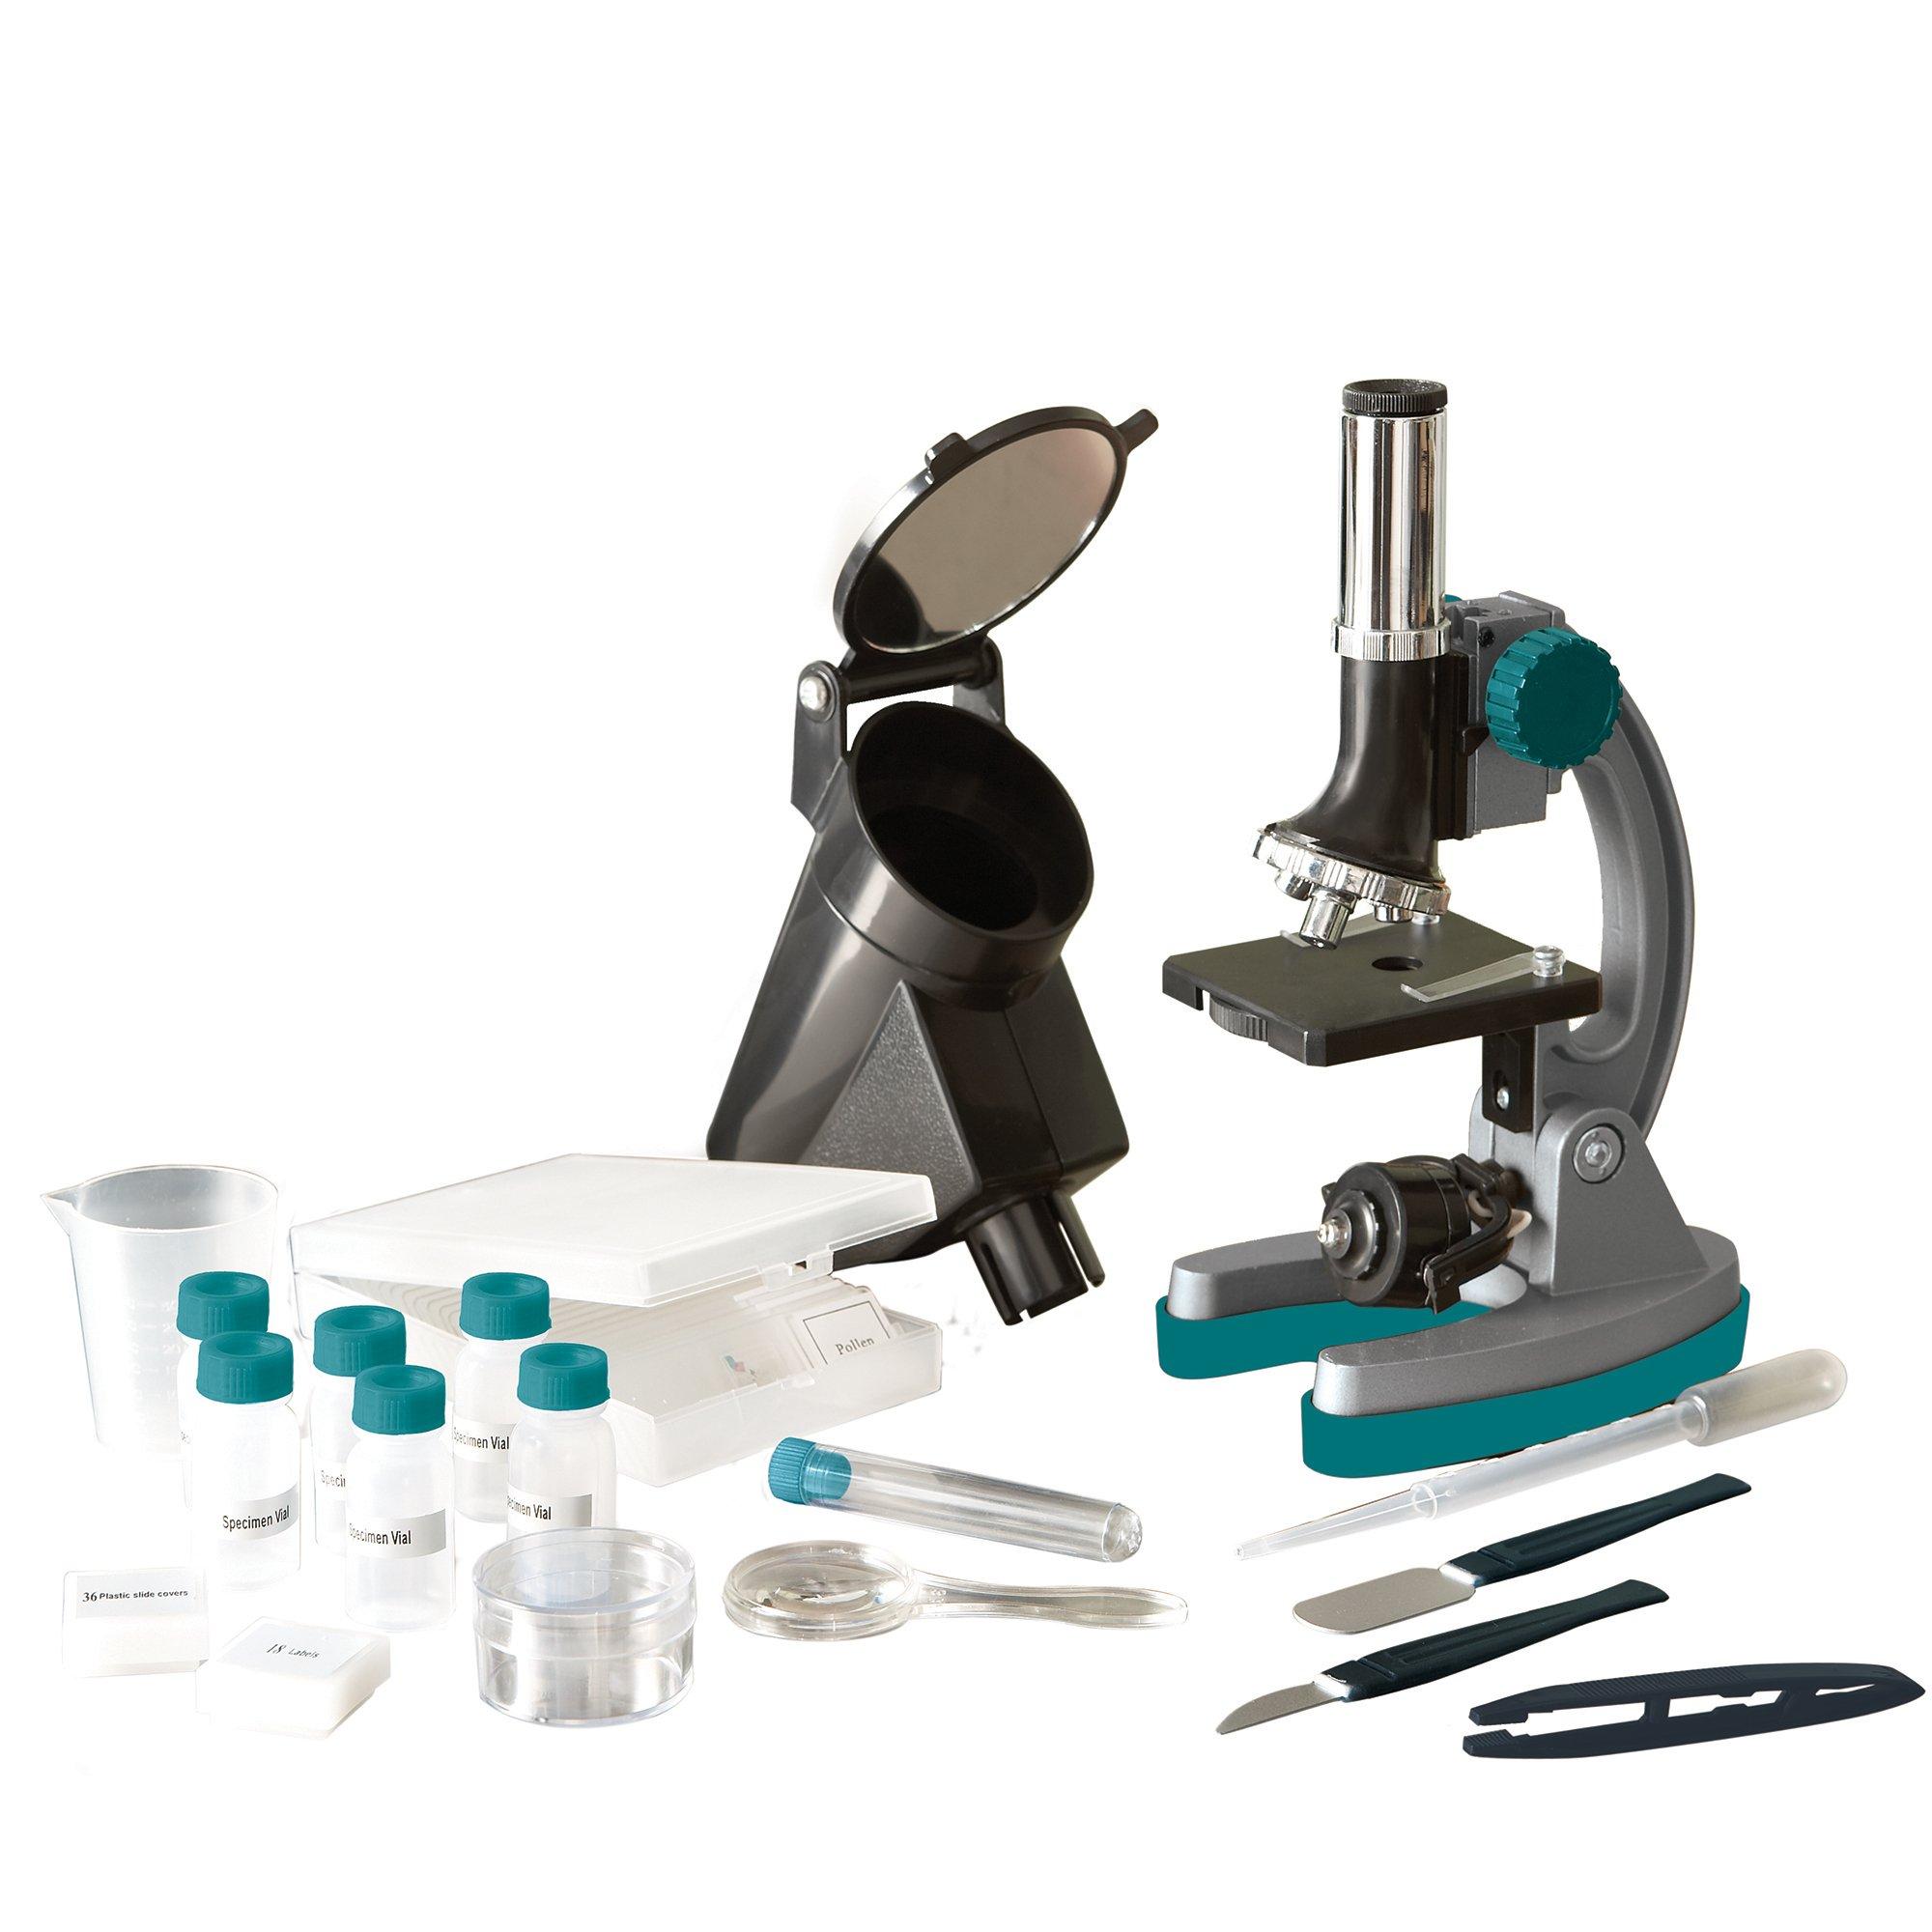 Educational Insights GeoSafari Micropro Elite 98-Piece Microscope Set by Educational Insights